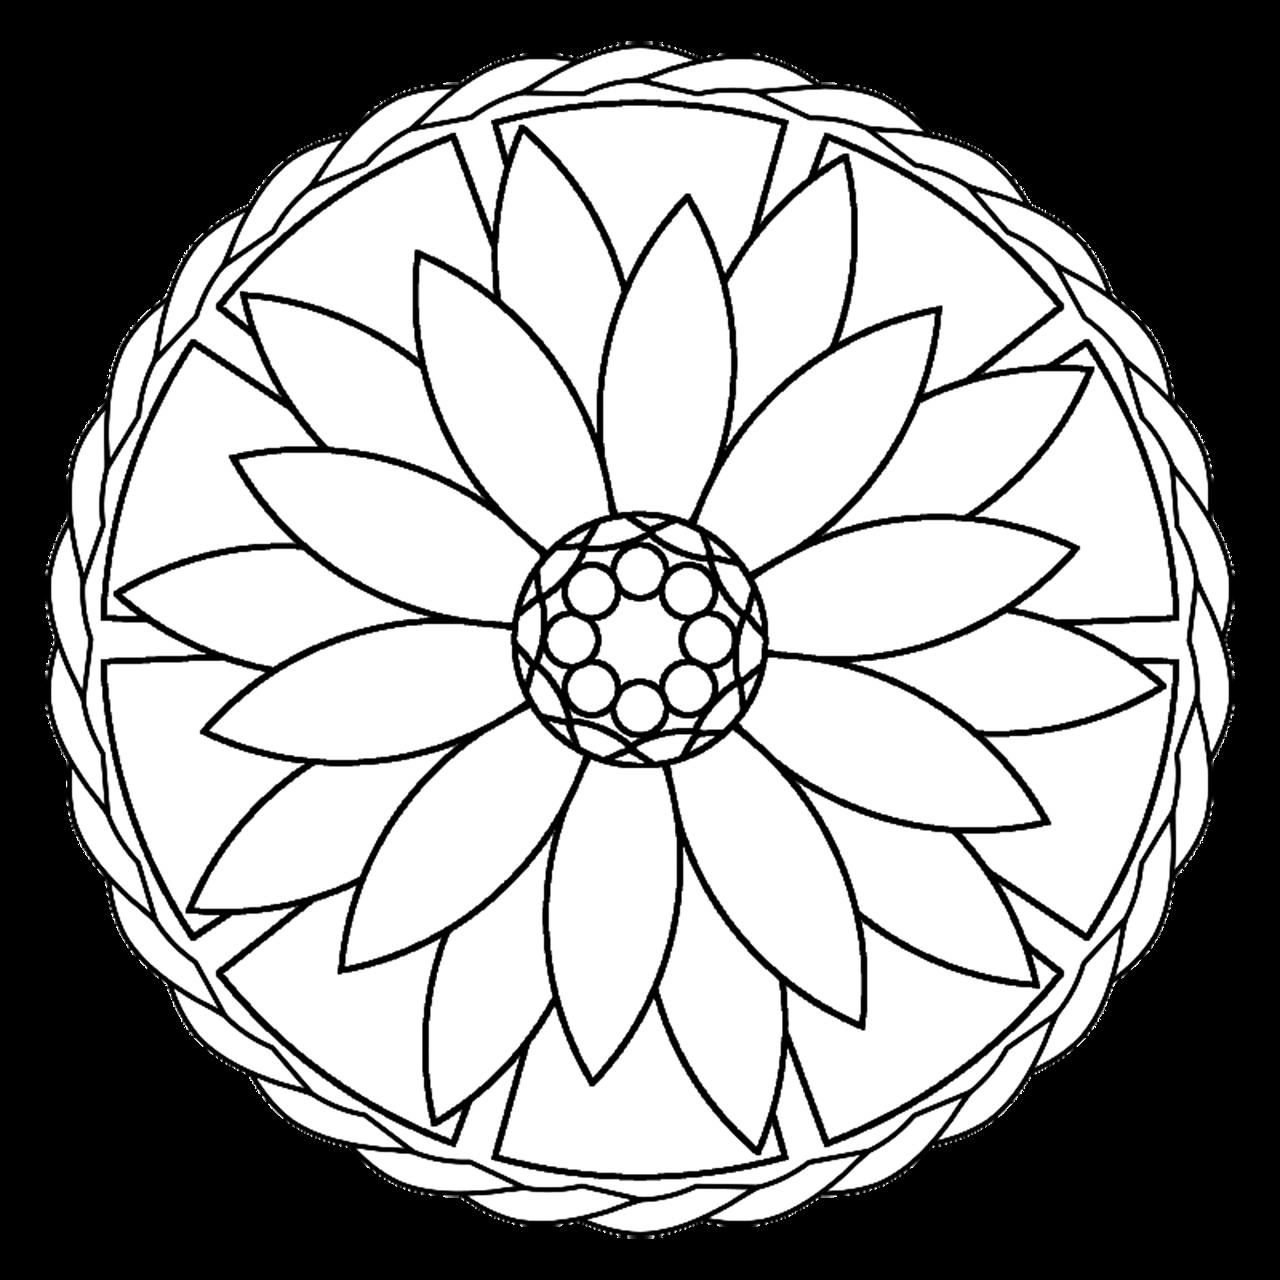 Imagen Gratis En Pixabay Mandala Simbolo Meditacion Mandalas